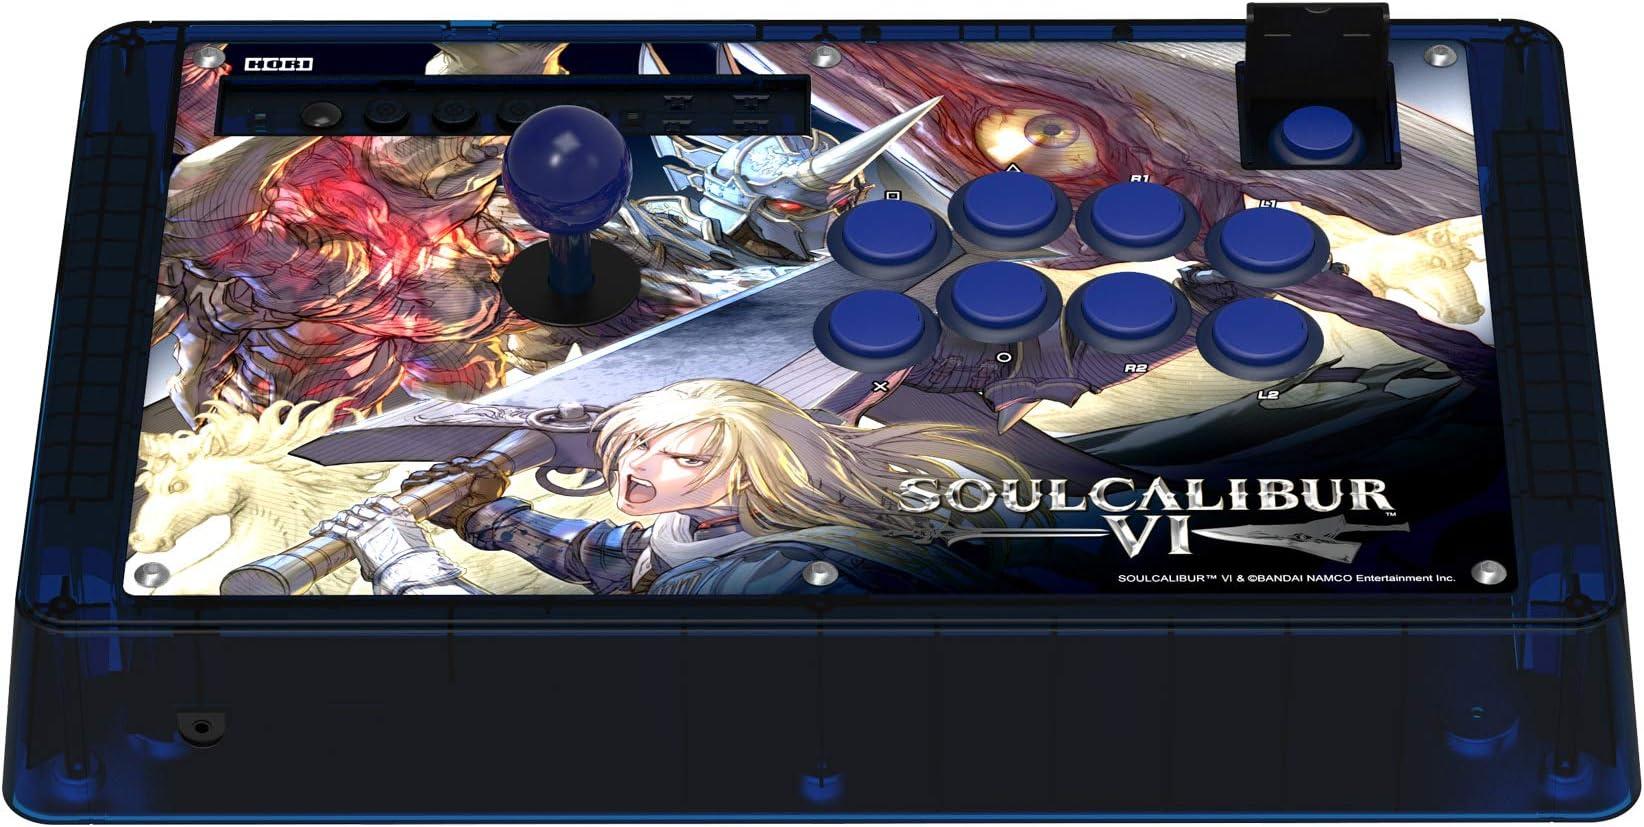 SoulCalibur VI |OT| A Tale Eternally Retold | ResetEra